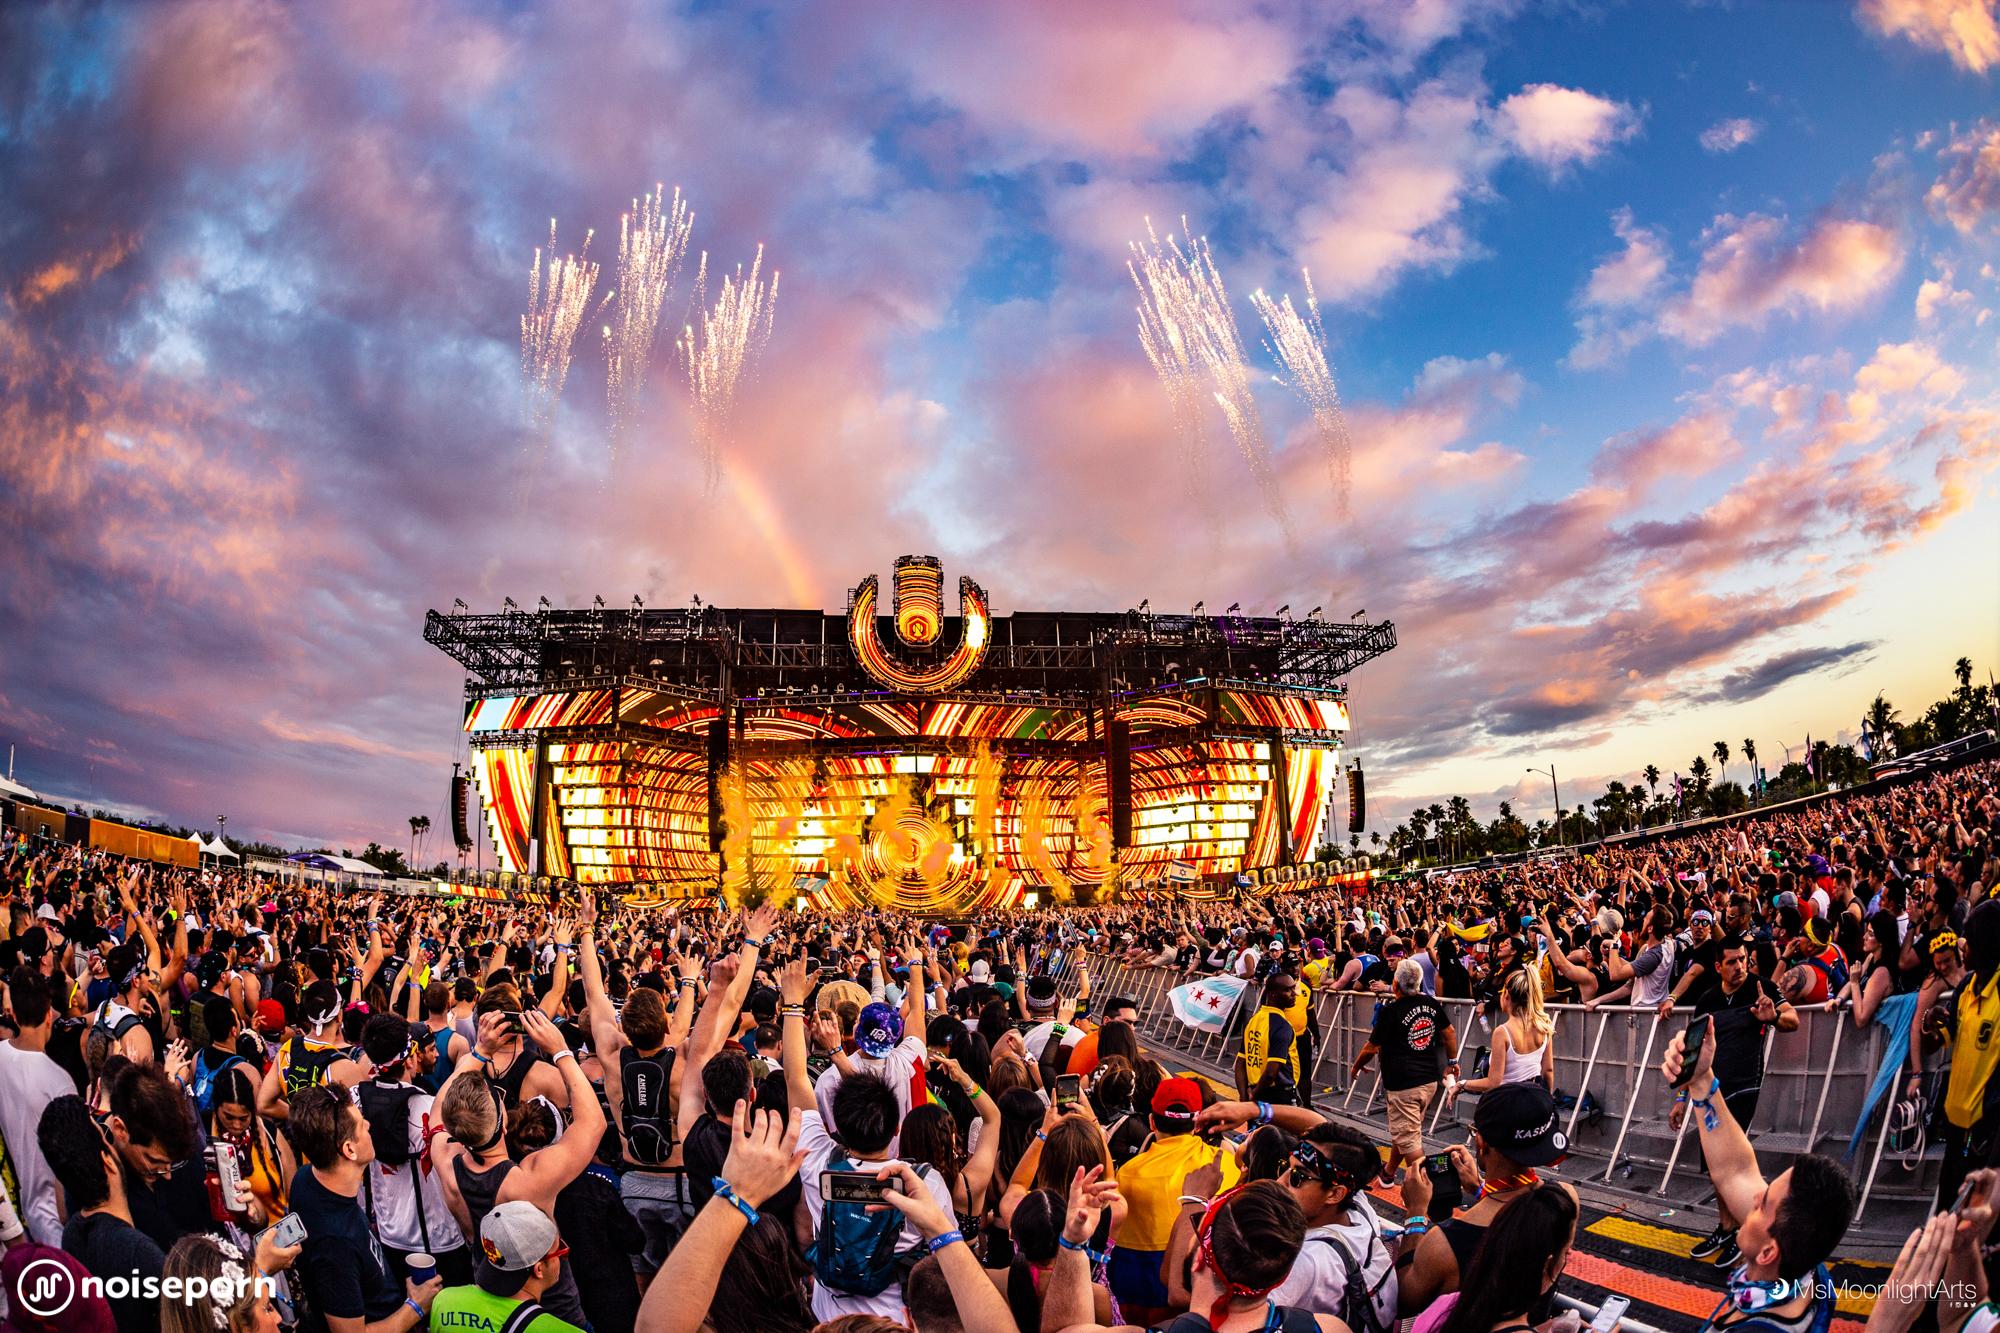 Ultra Music Festival 2019 Photos